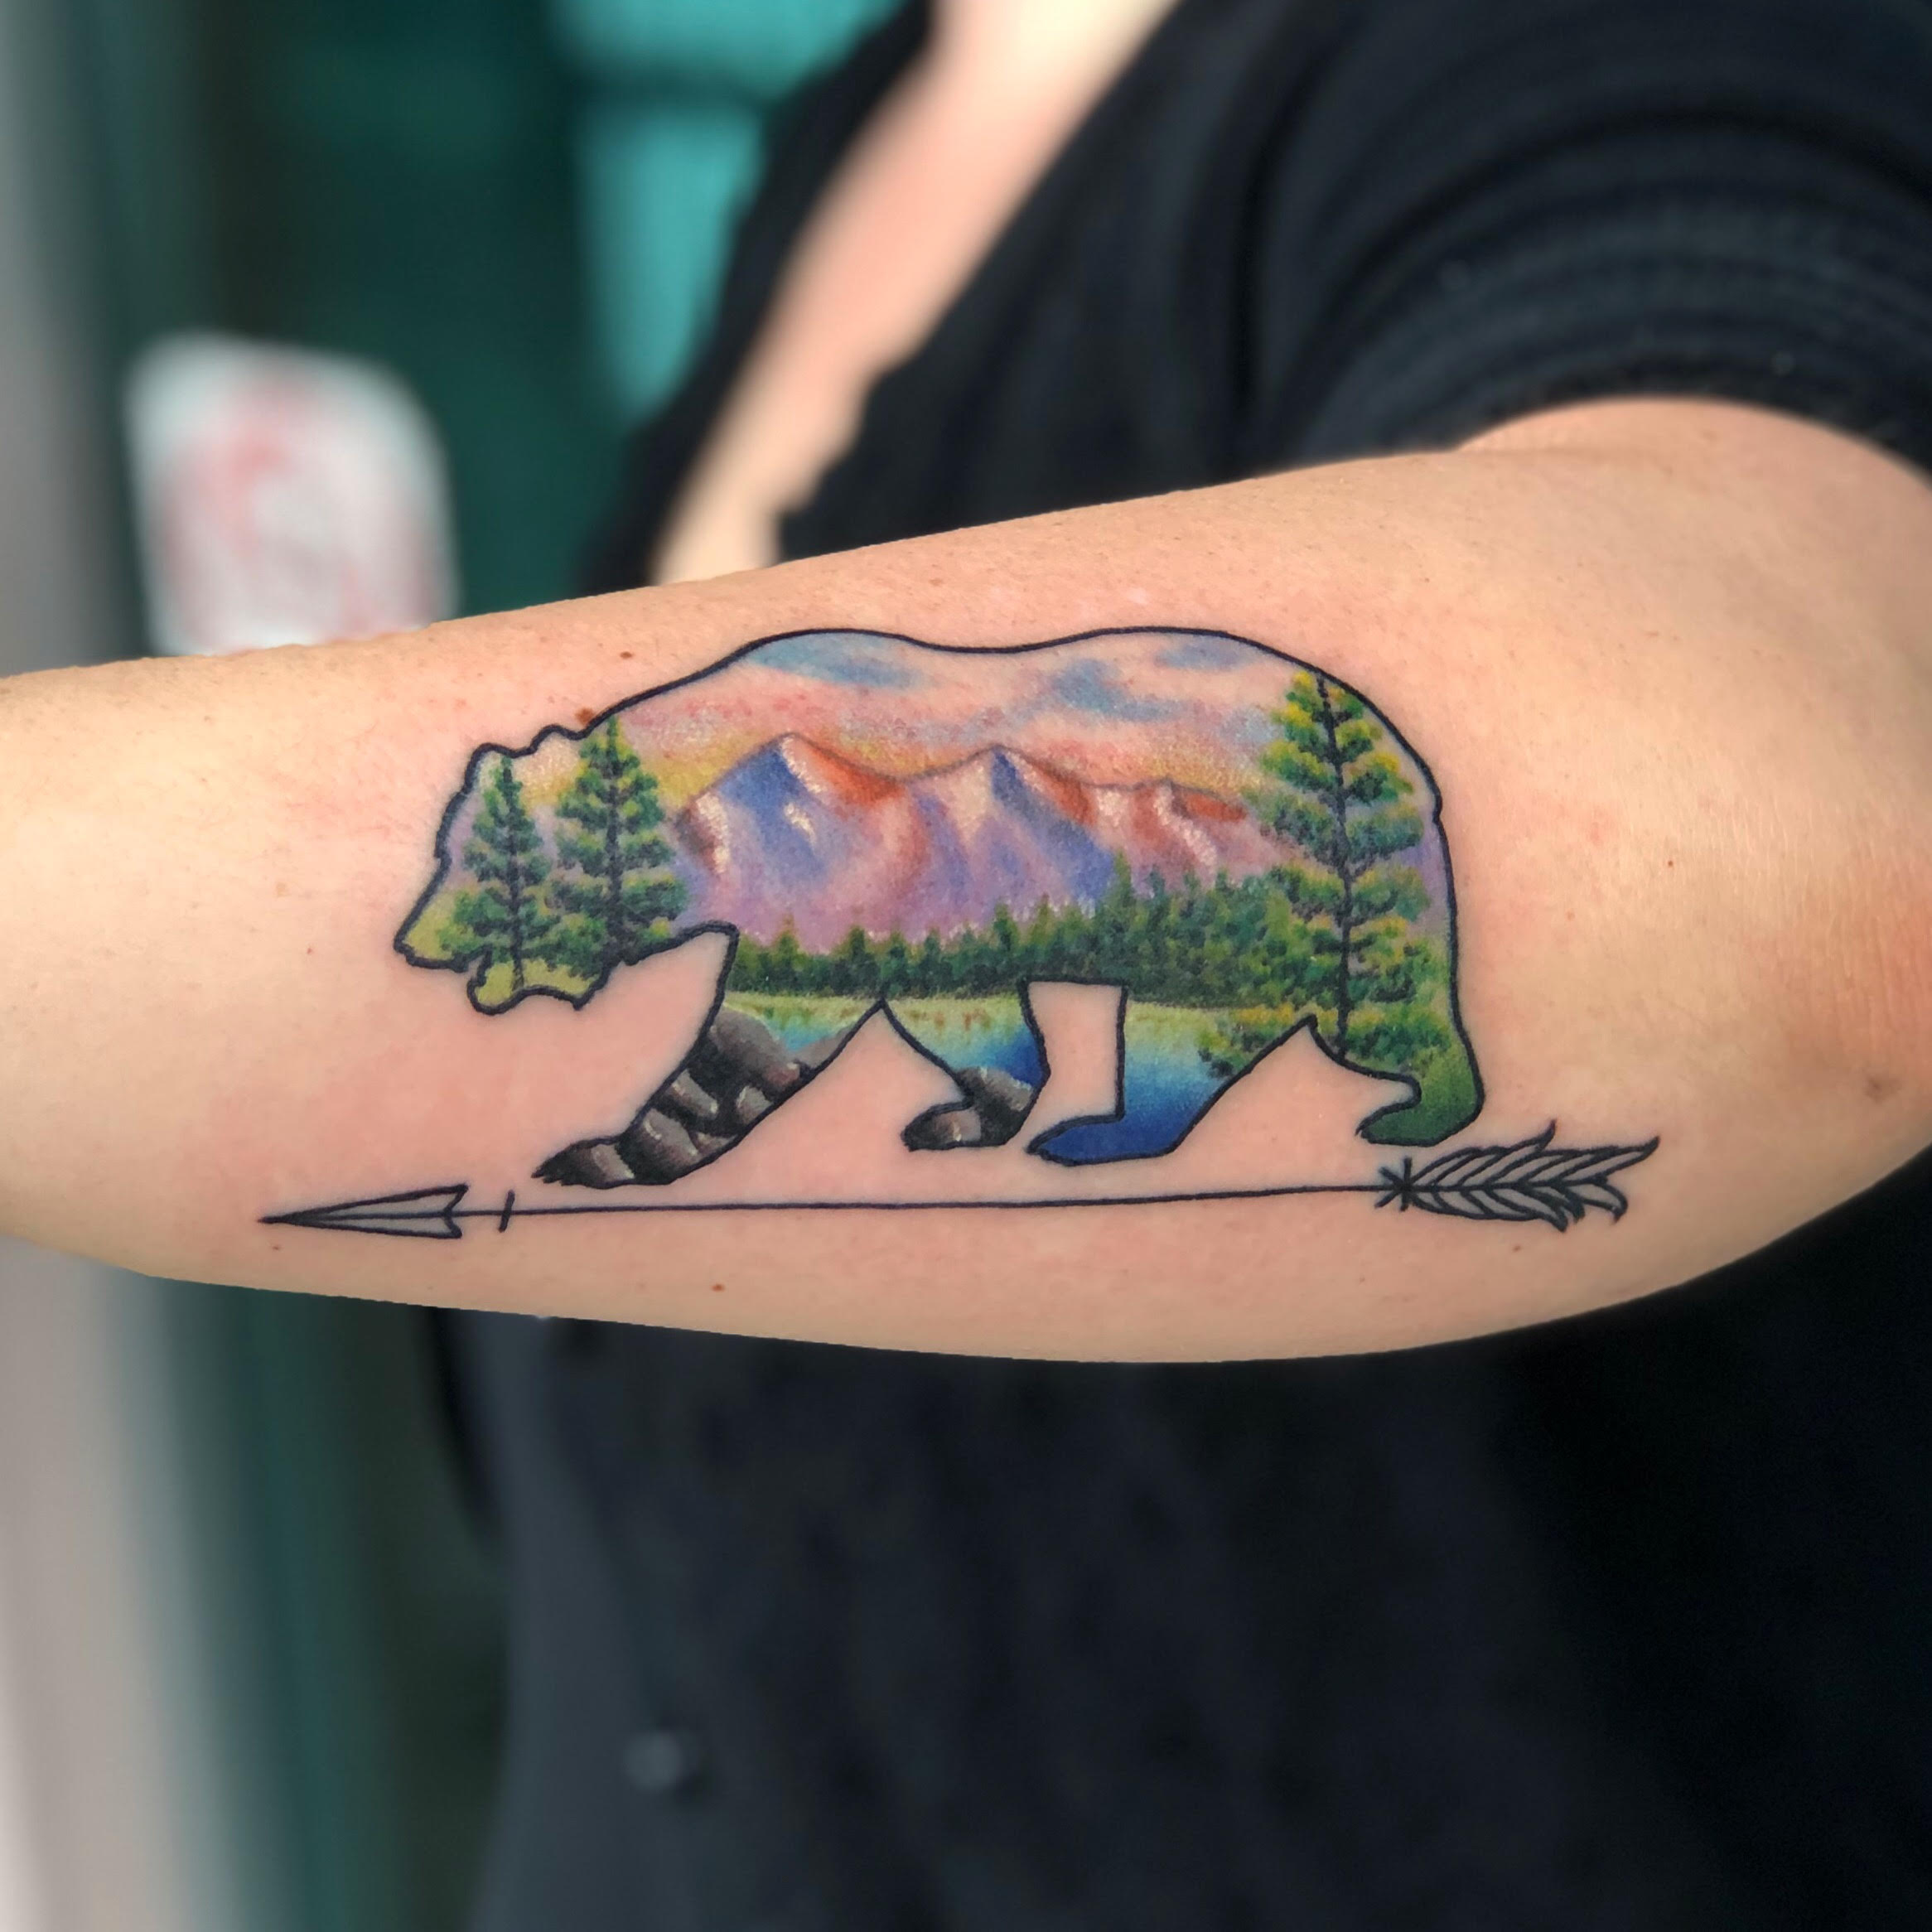 Josh Herrera World Renown Tattoo Artist Bluenote Tattoo Las Vegas Nv